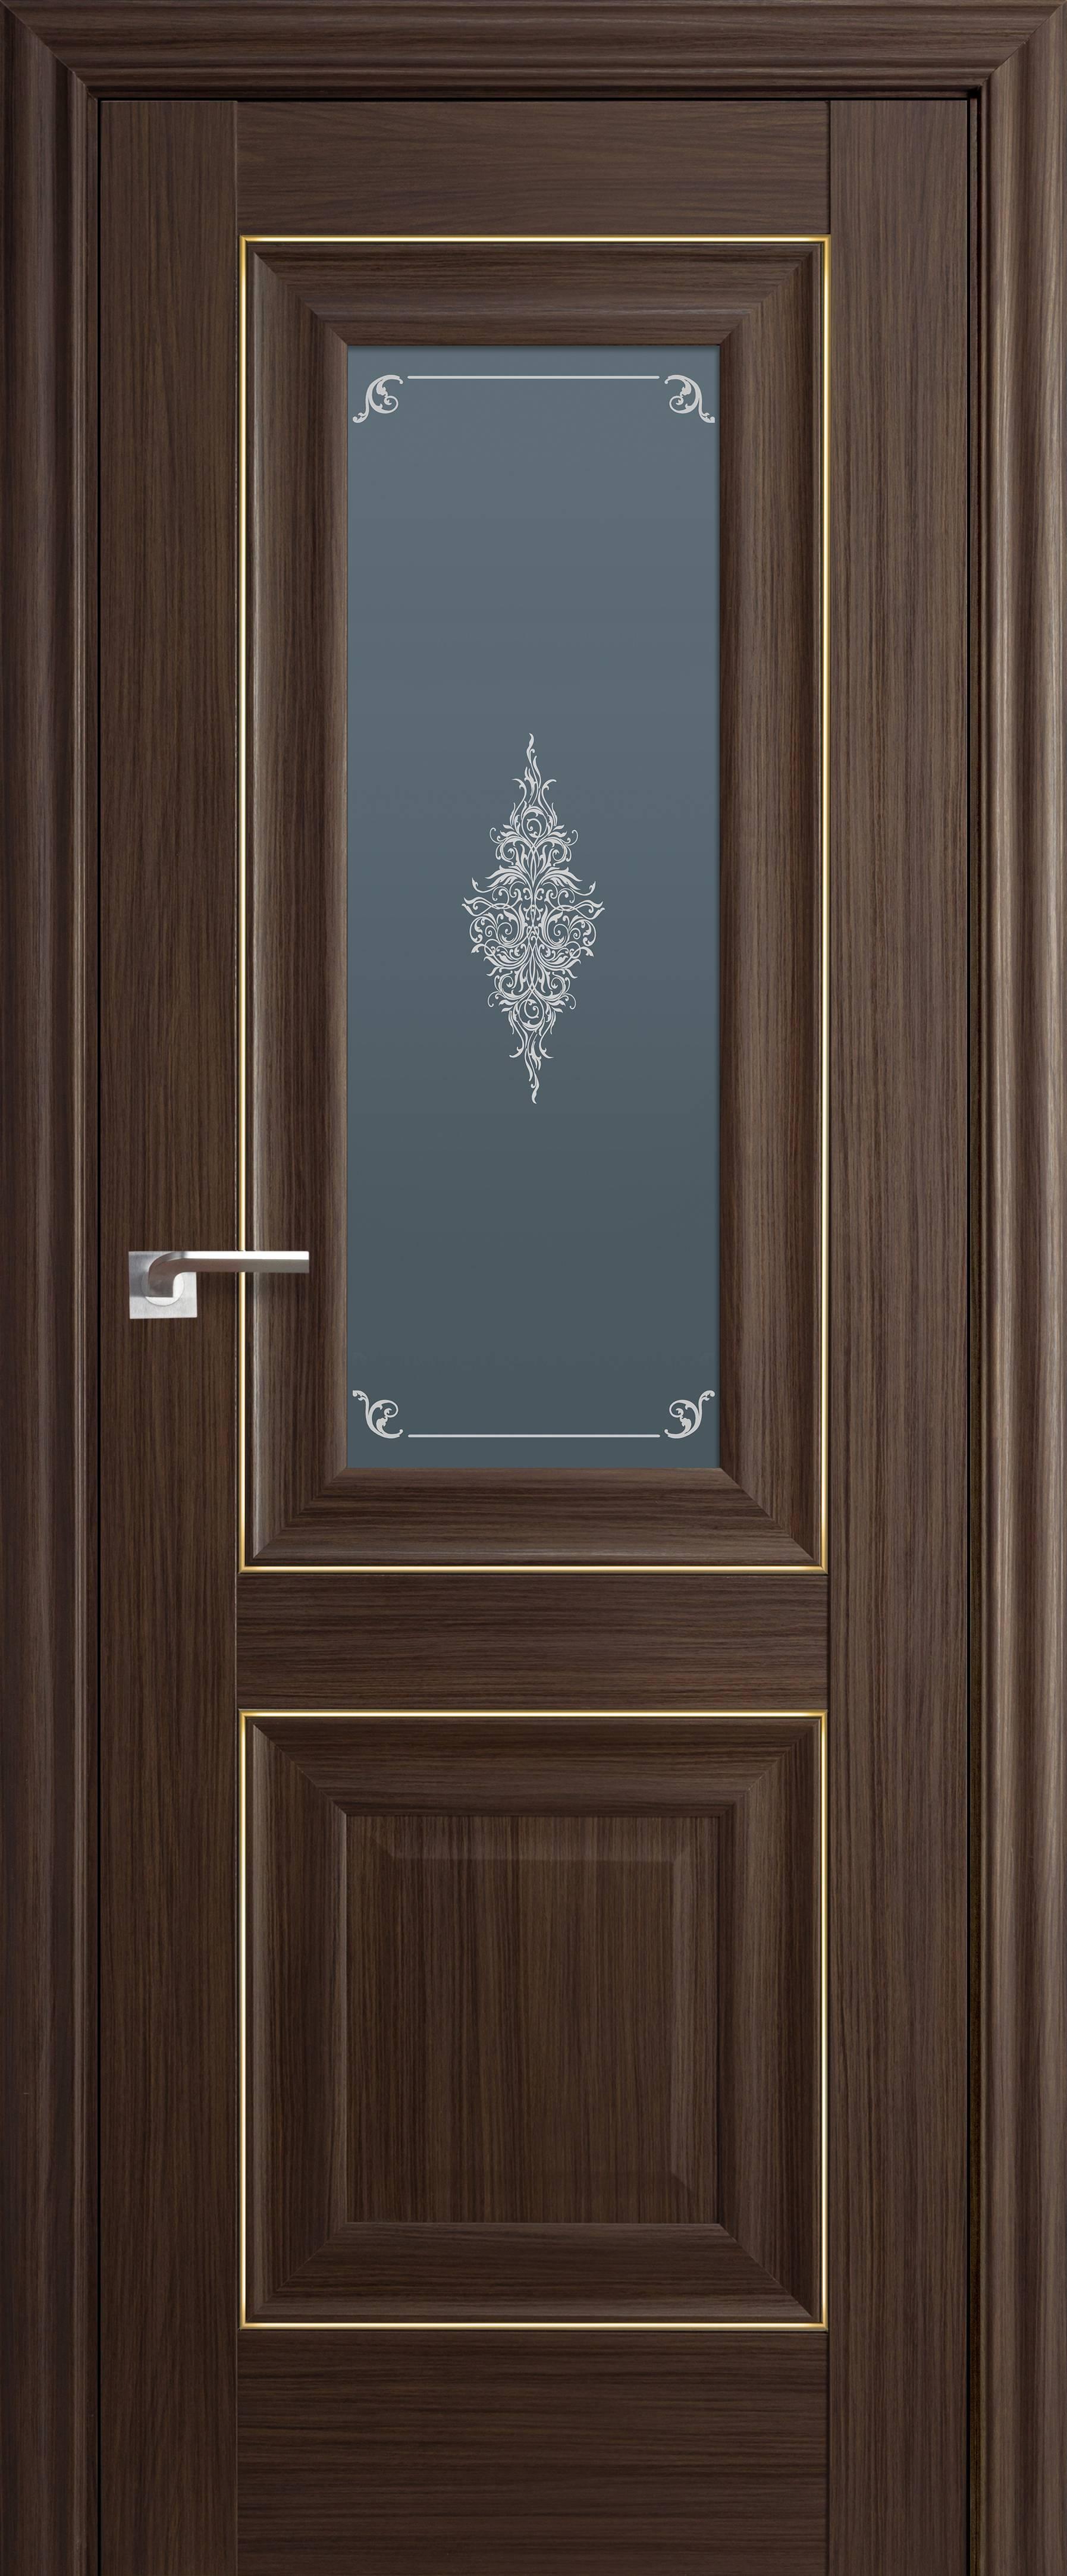 Фото двери Модель 28Х